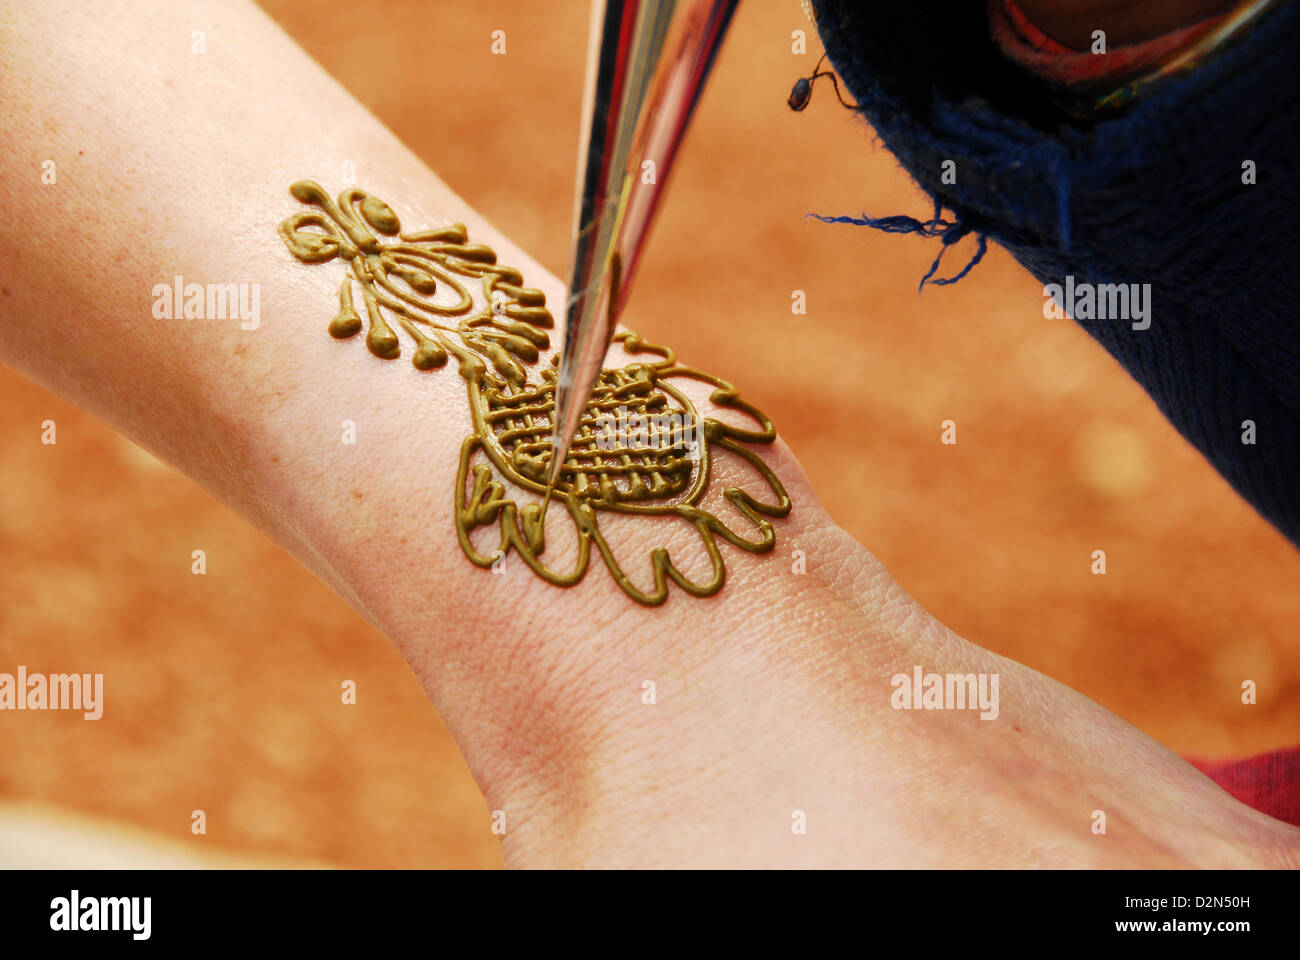 Drawing henna on hand, New Delhi, India, Asia - Stock Image